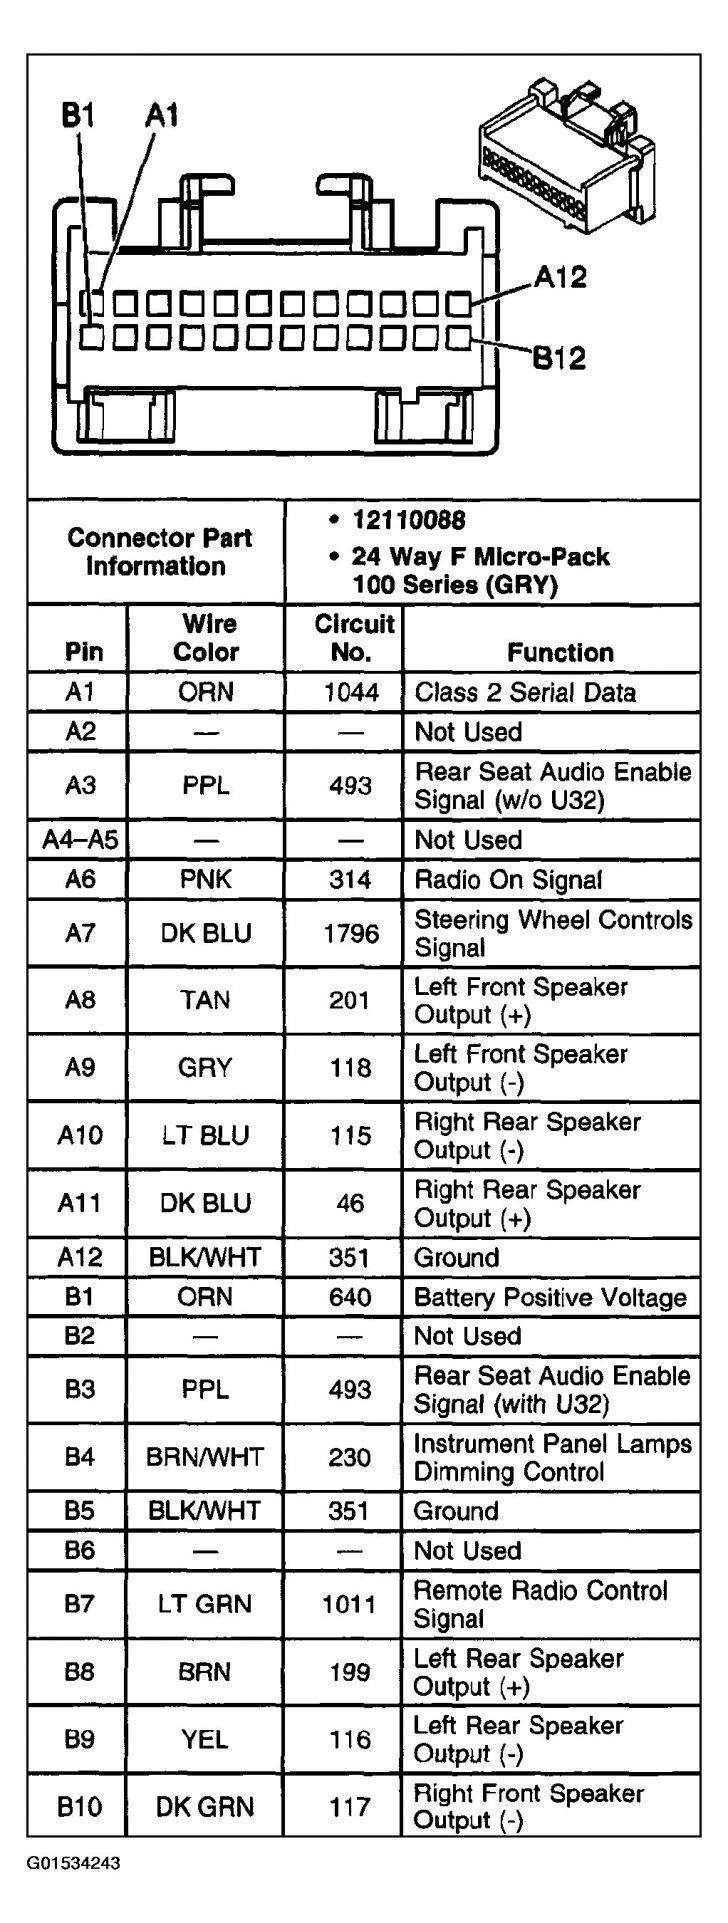 2002 Chevy Trailblazer Radio Wiring Diagram